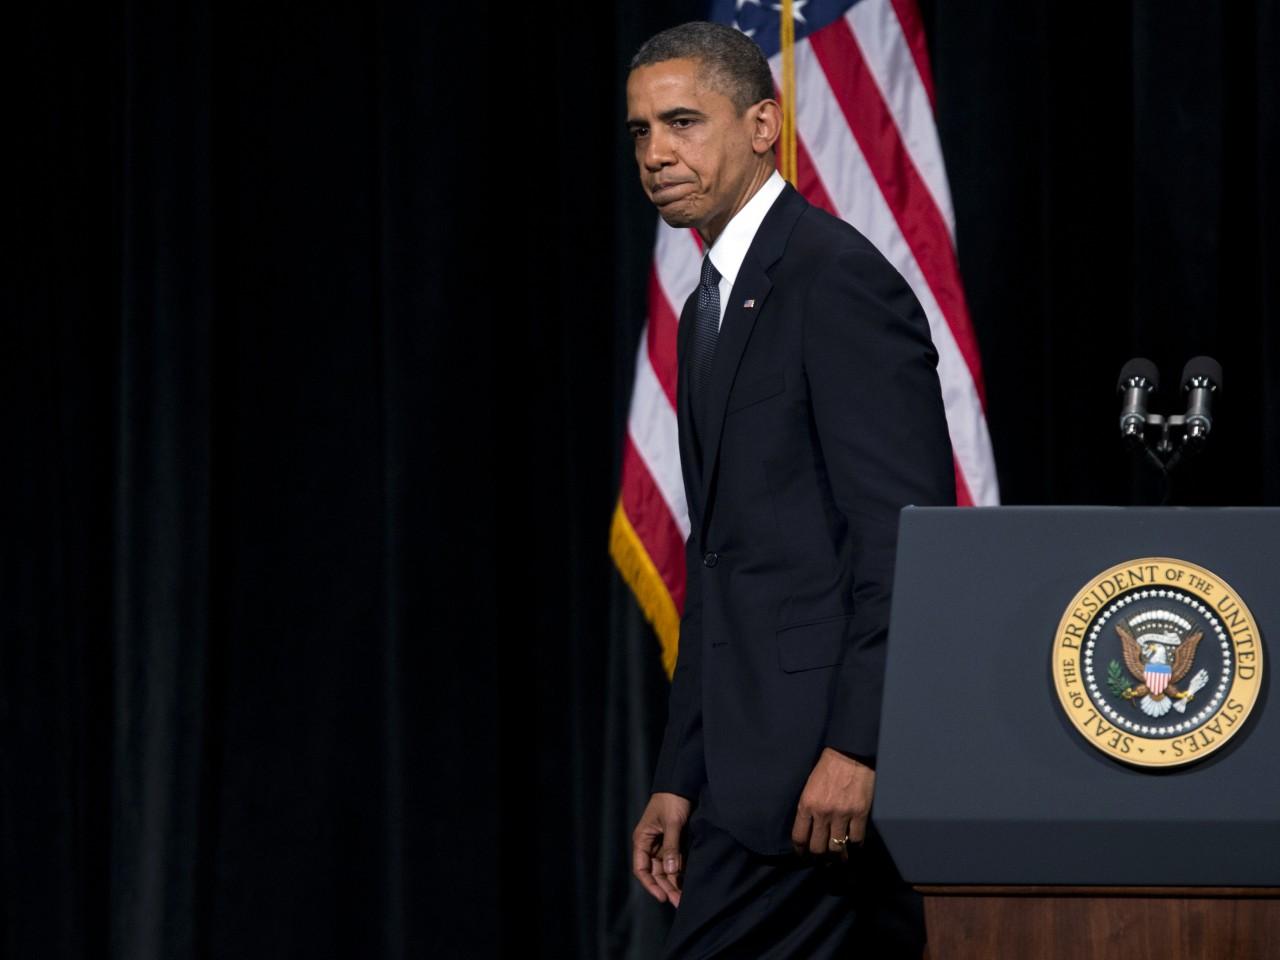 obama-connecticut-school-shooting_jpeg4-1280x960